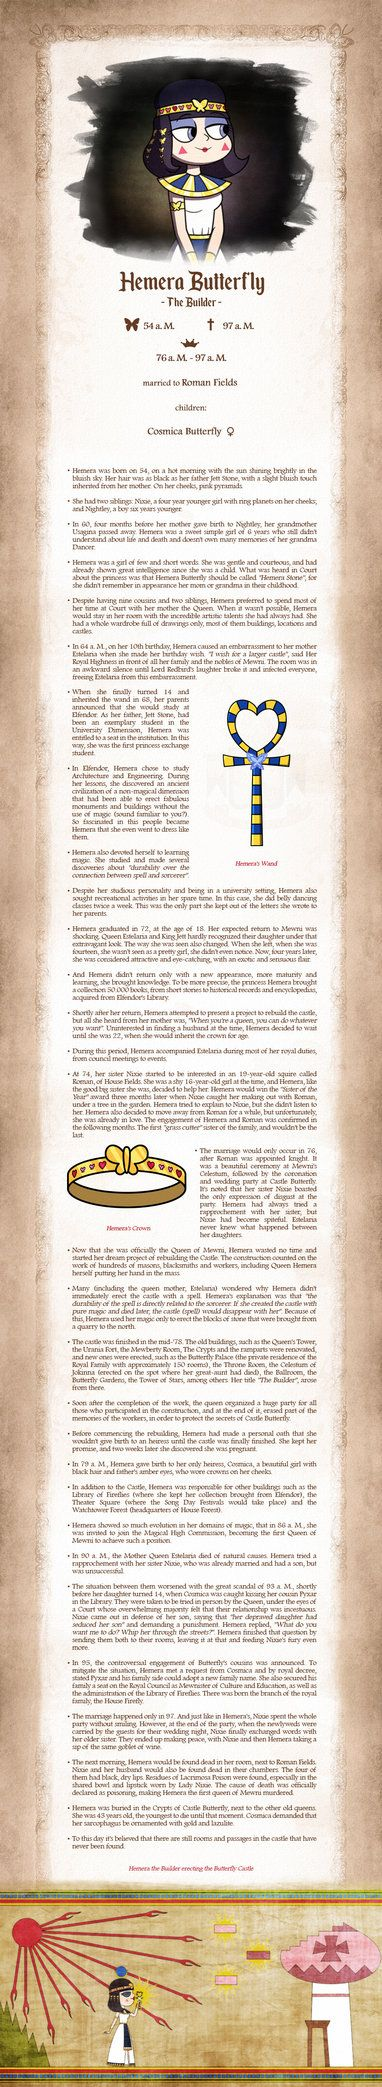 Hemera the Builder - Biography by jgss0109